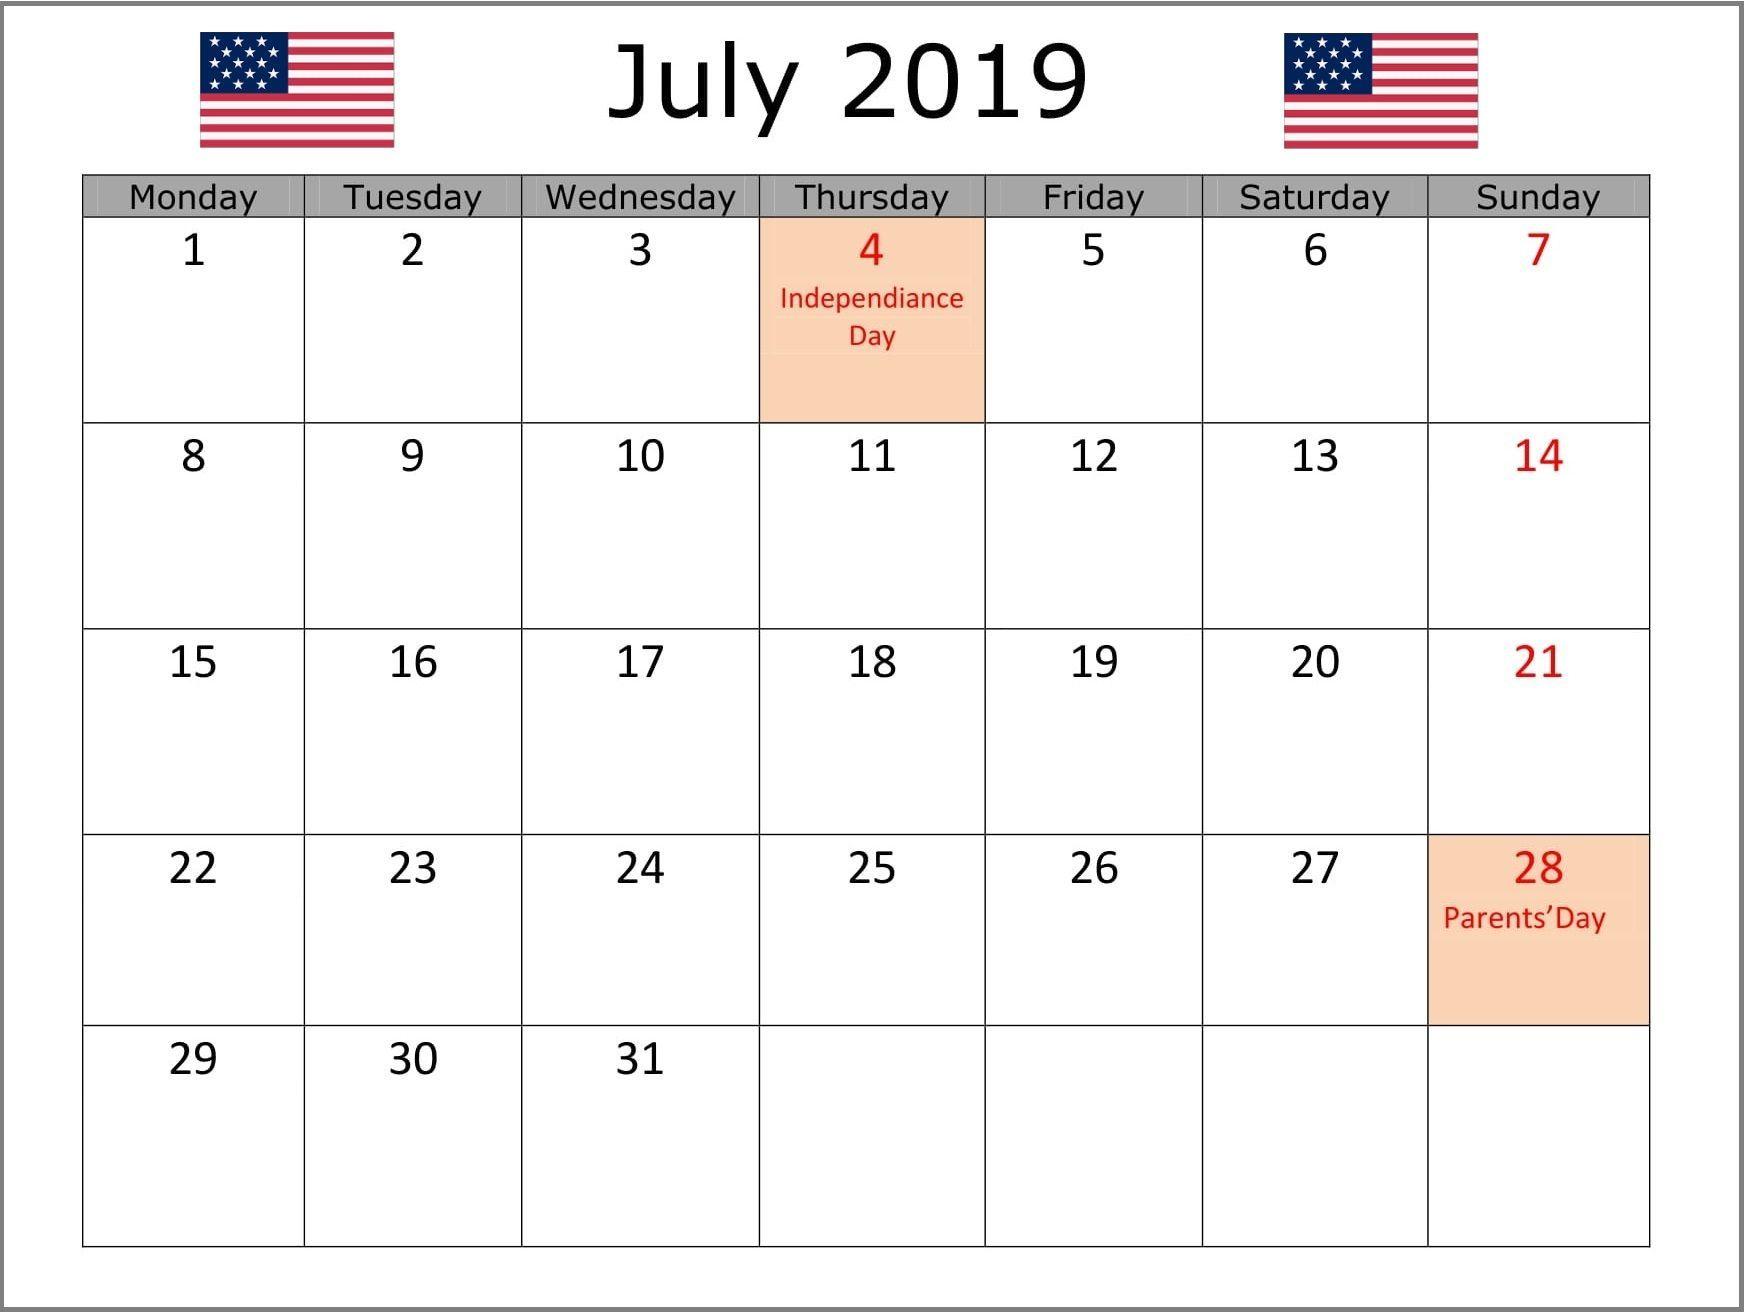 July 2019 Calendar Usa Holiday Calendar Us Holiday Calendar